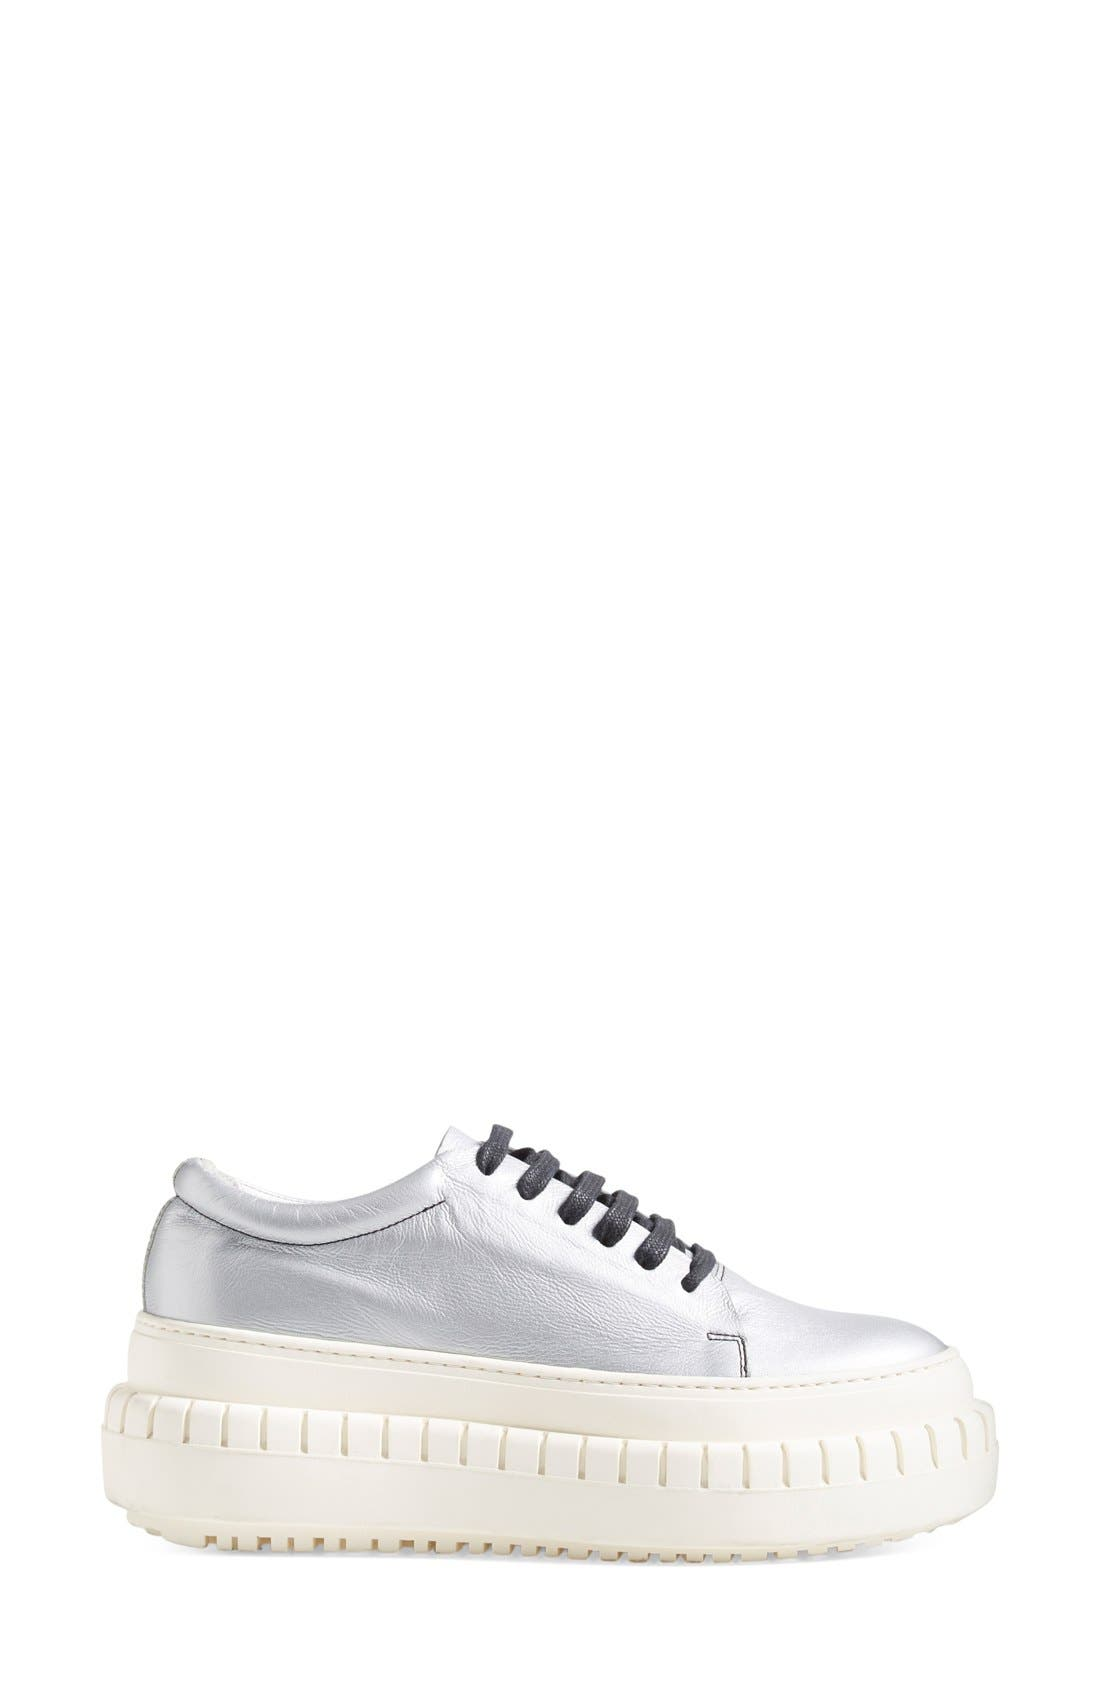 ACNE STUDIOS,                             ACNE Studio 'Saddy' Platform Sneaker,                             Alternate thumbnail 2, color,                             040